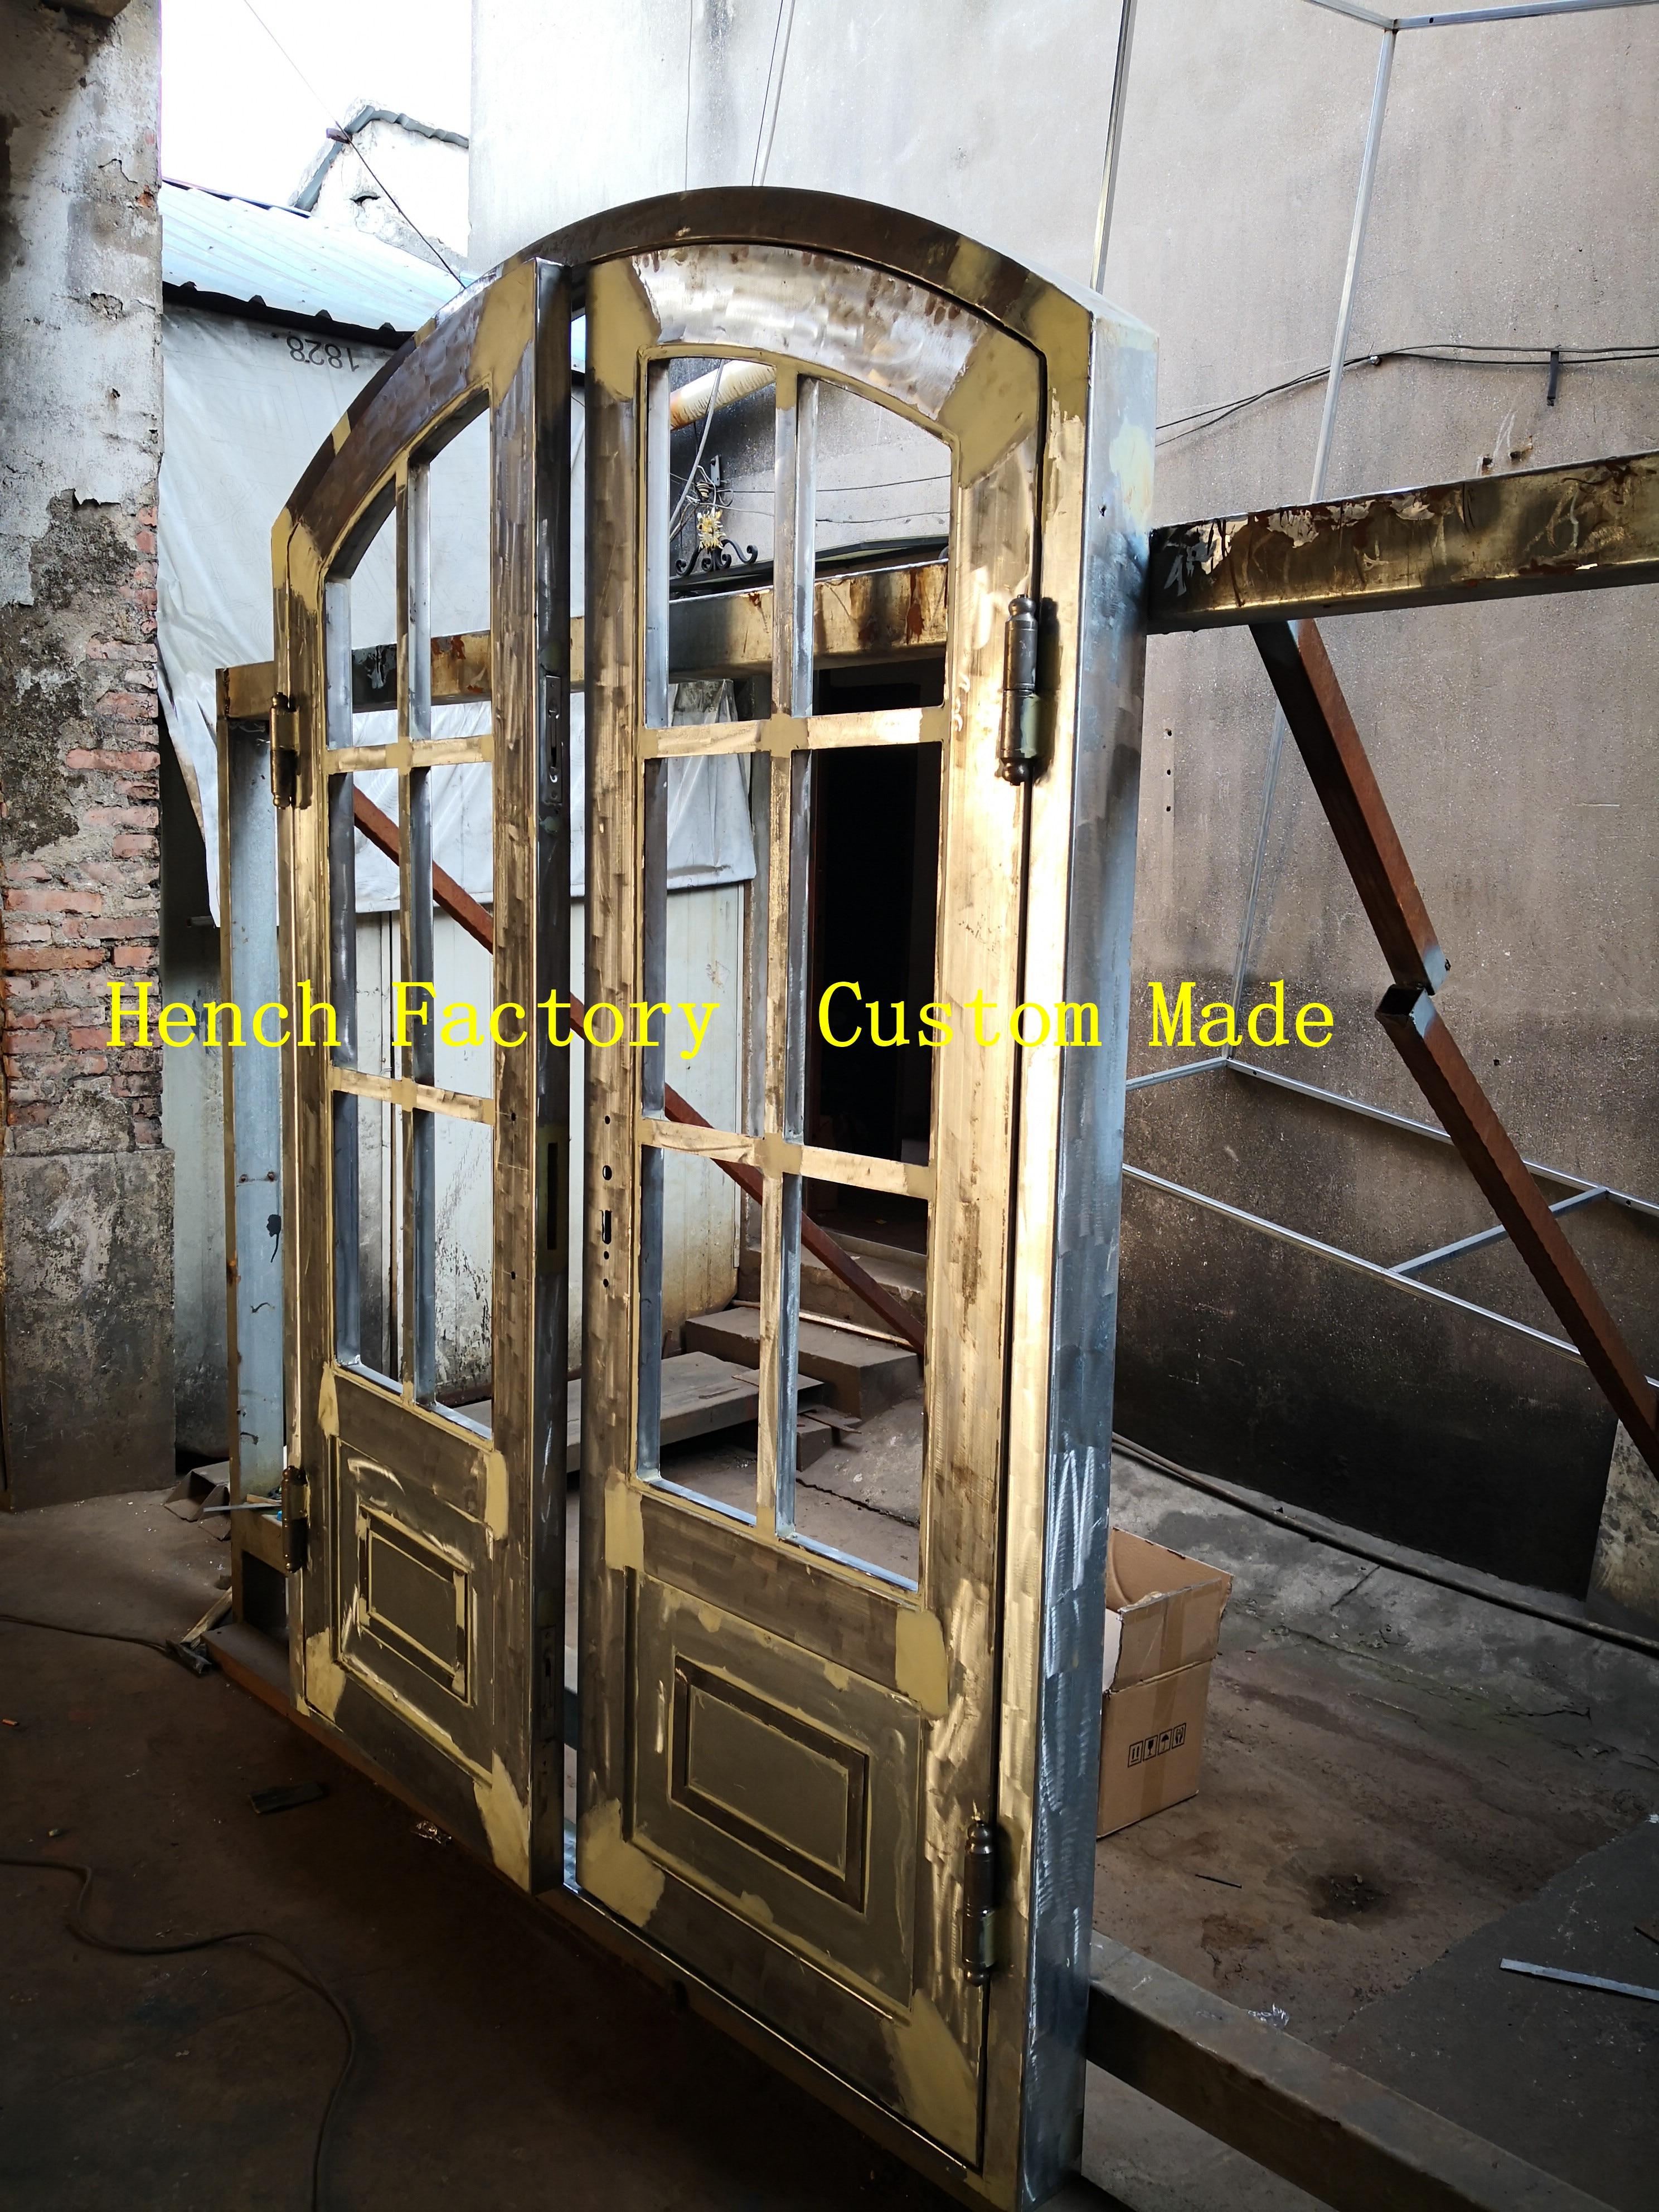 Shanghai Hench Brand China Factory 100% Custom Made Sale Australia Ornamental Iron Security Doors